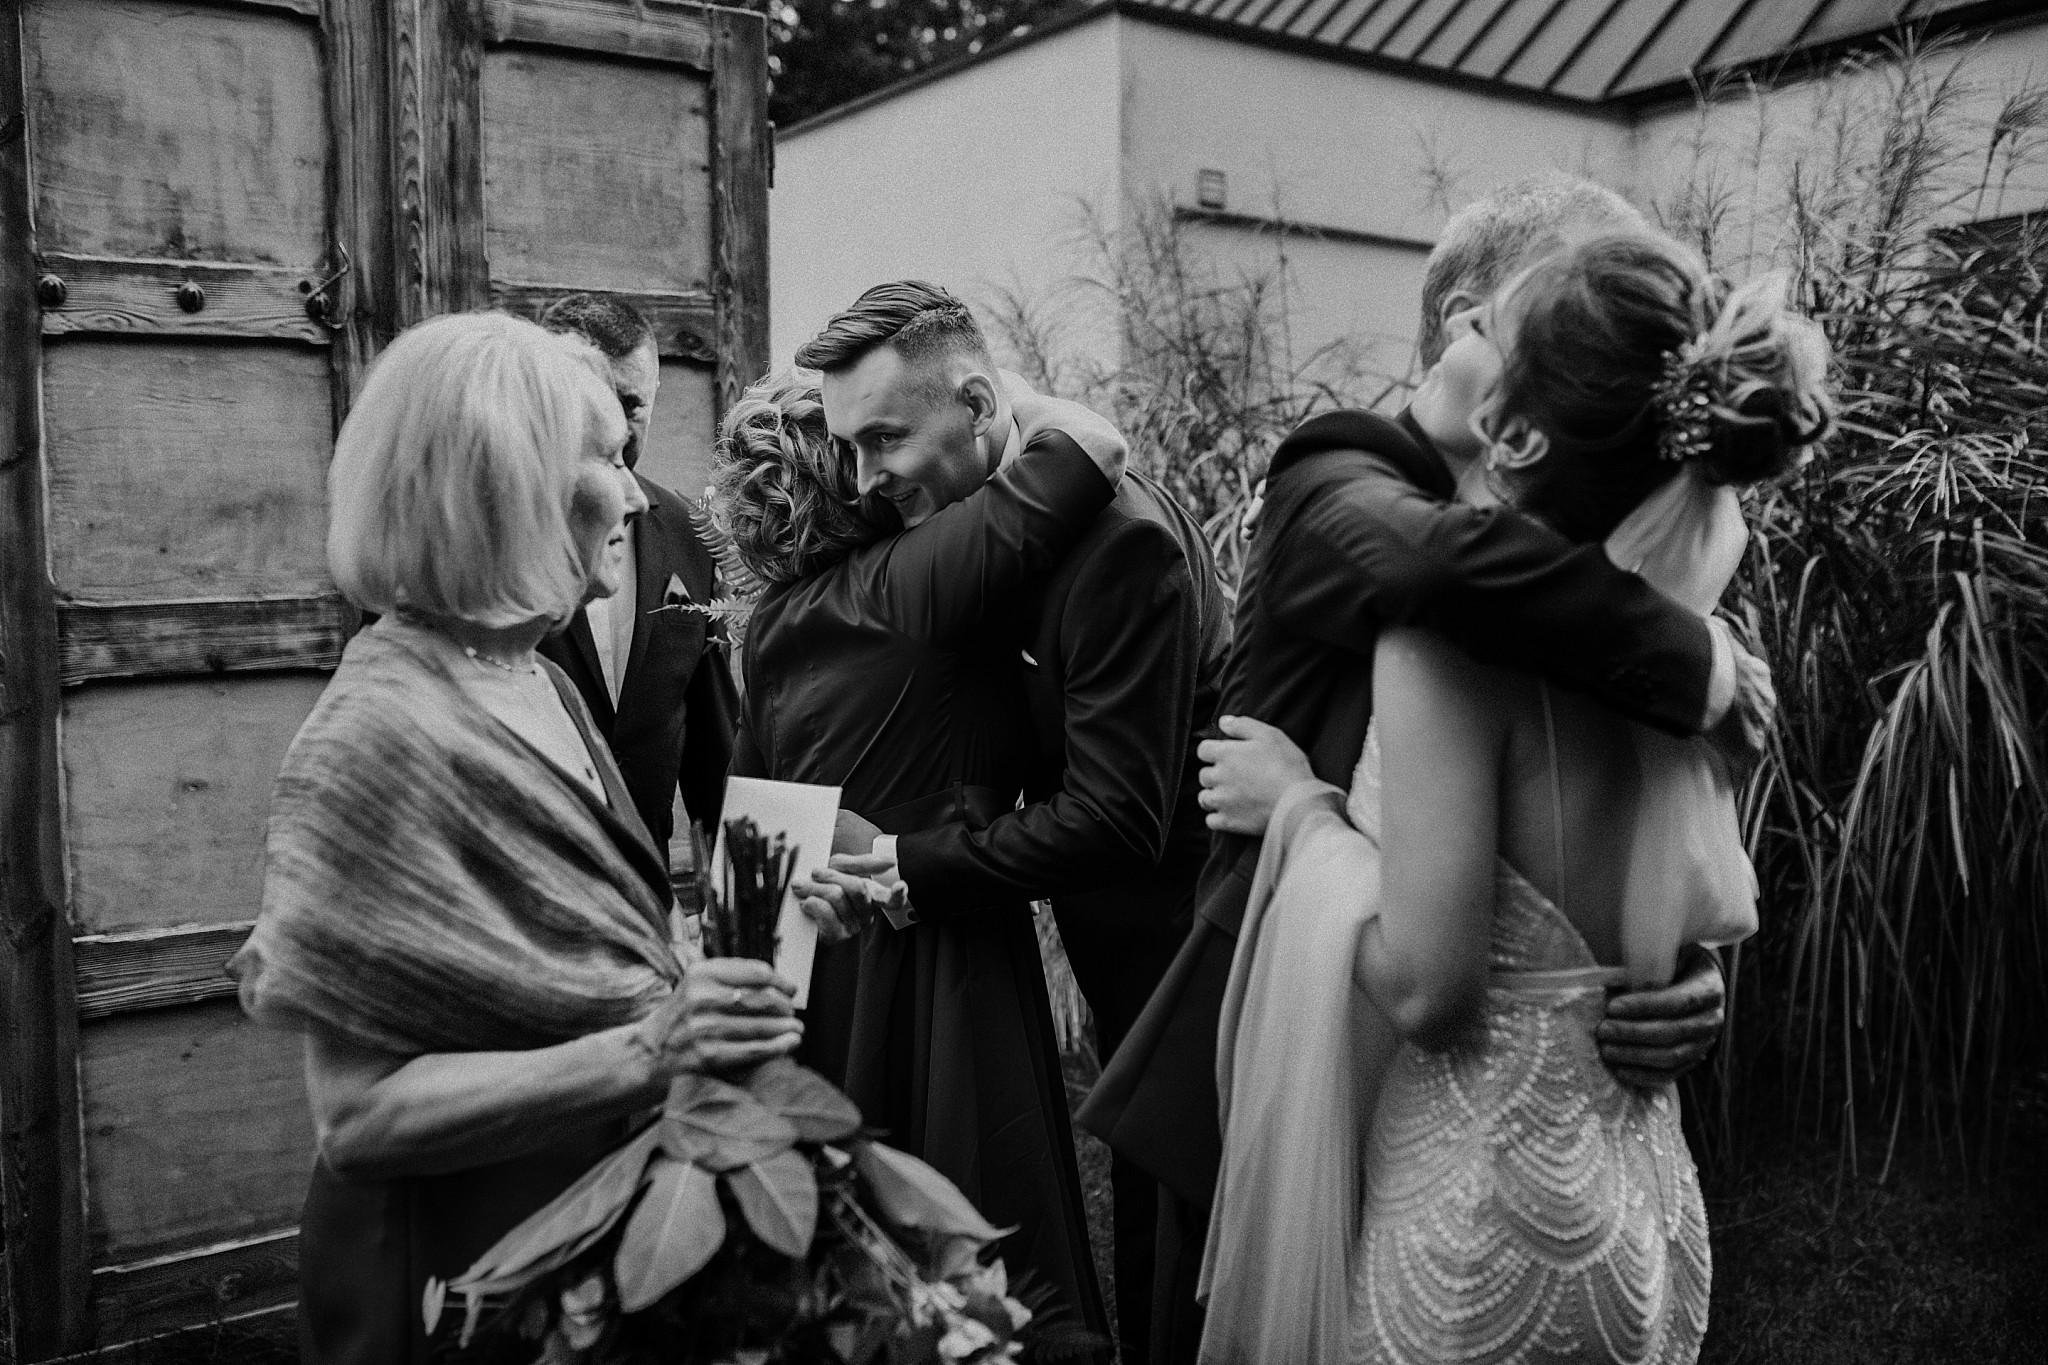 fotograf poznan wesele dobra truskawka piekne wesele pod poznaniem wesele w dobrej truskawce piekna para mloda slub marzen slub koronawirus slub listopad wesele koronawirus 102